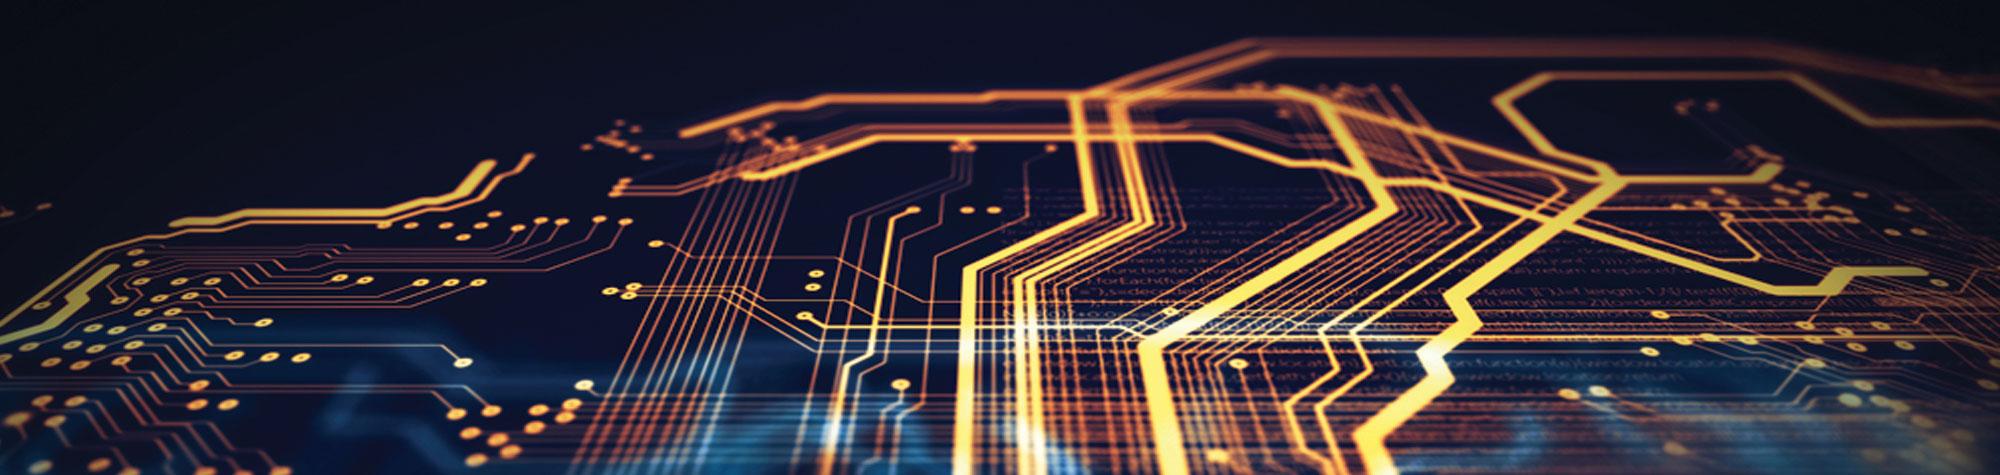 Dahua Technology USA Brings Smart H.265+ Technology to Its Line of NVRs